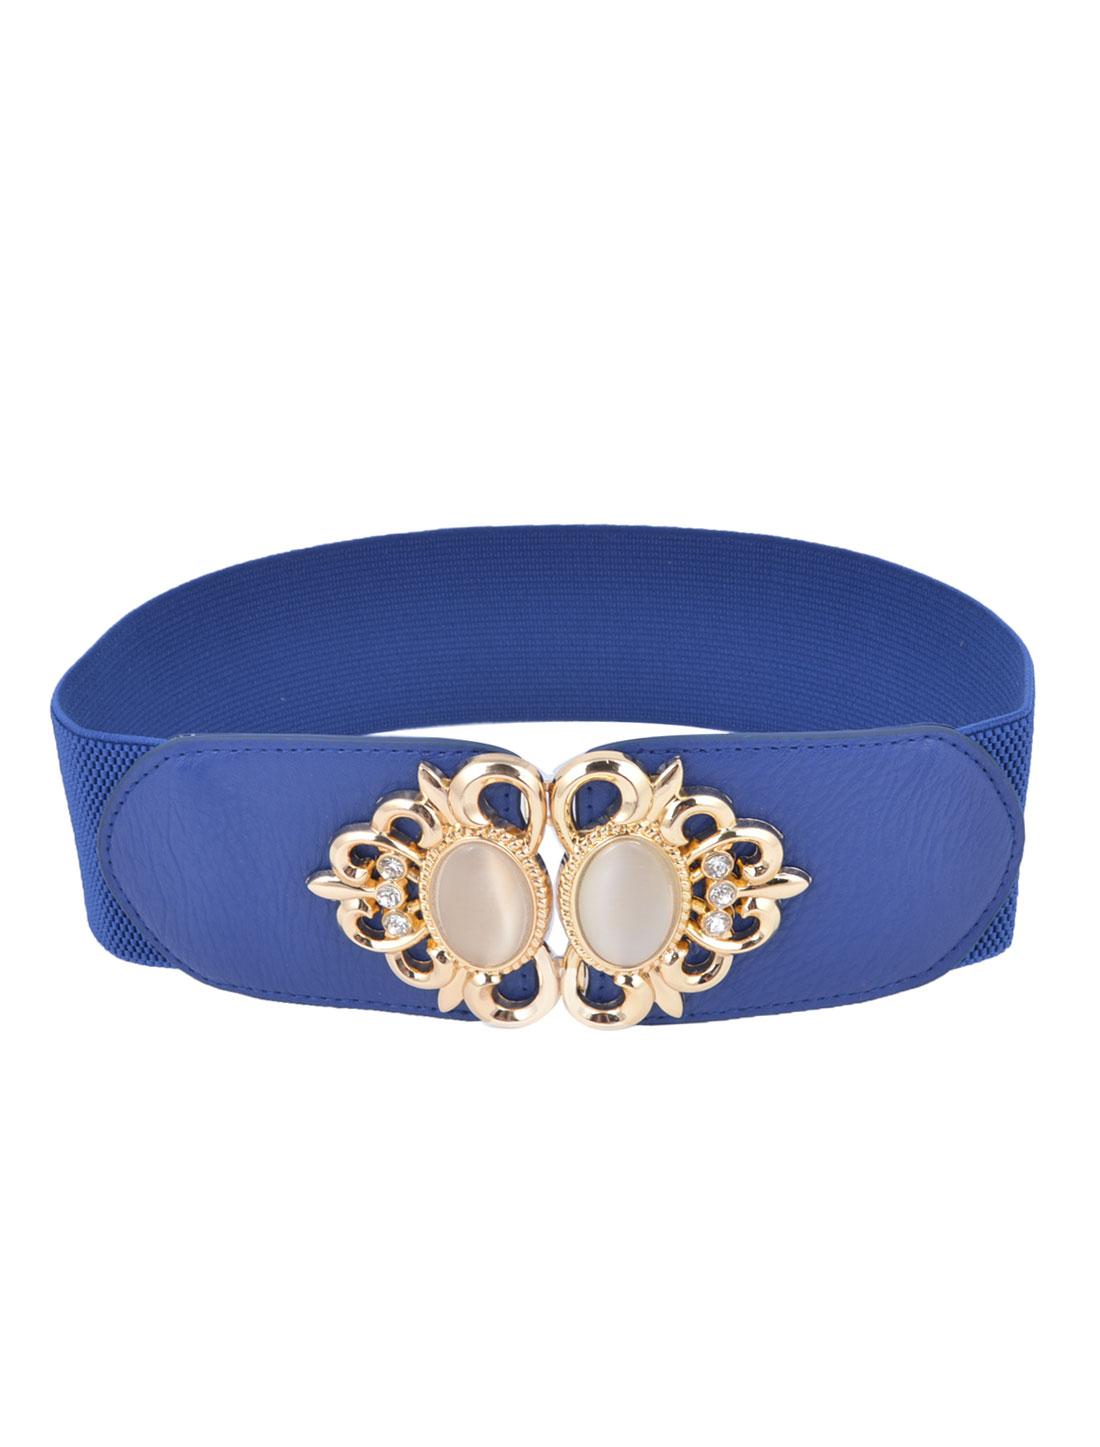 Ladies Plastic Bead Inlay Flower Frame Interlocking Buckle Elastic Waist Belt Royal Blue